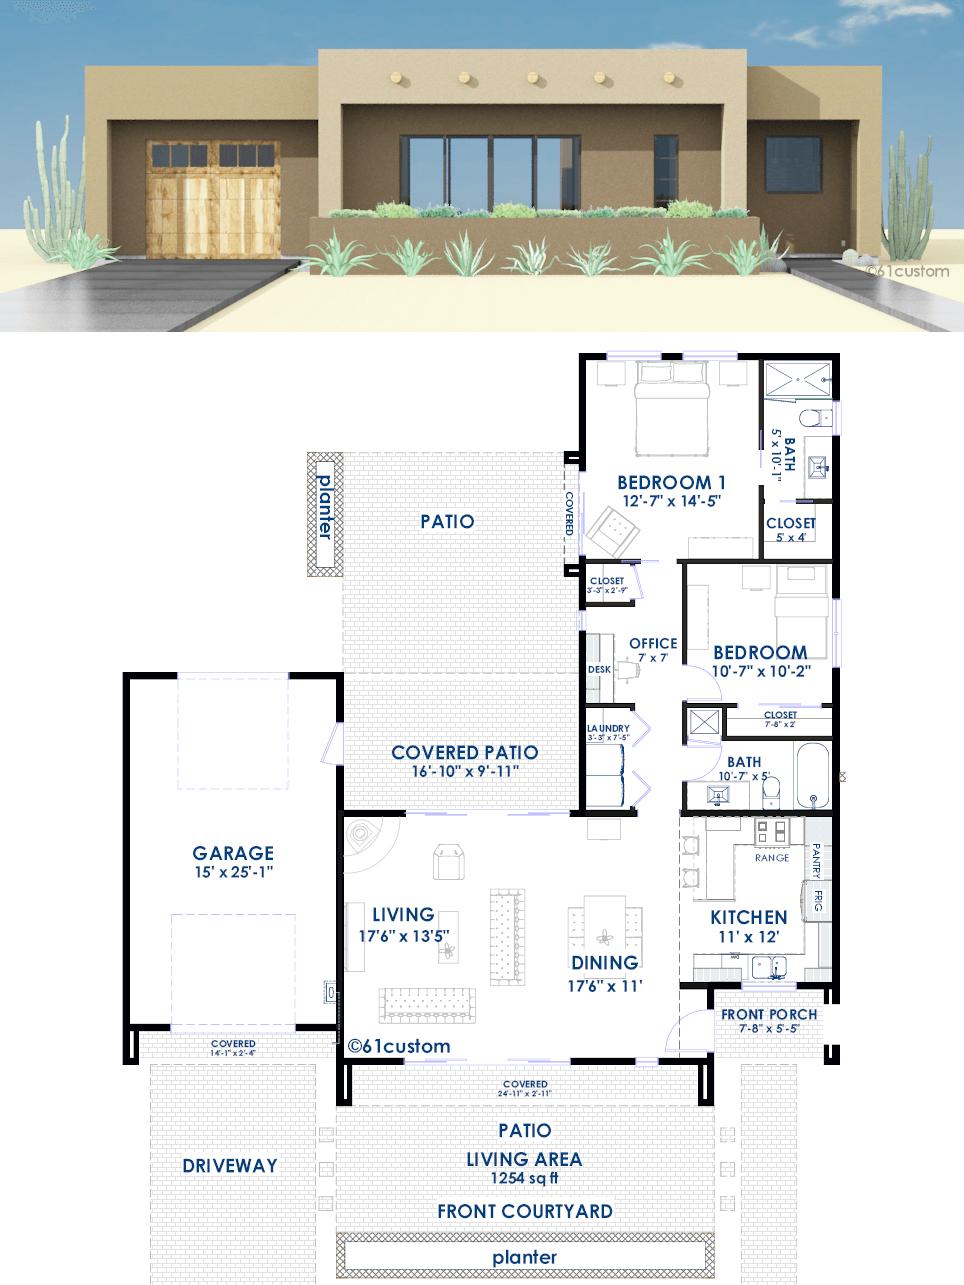 Contemporary Adobe House Plan 61custom Contemporary Modern House Plans